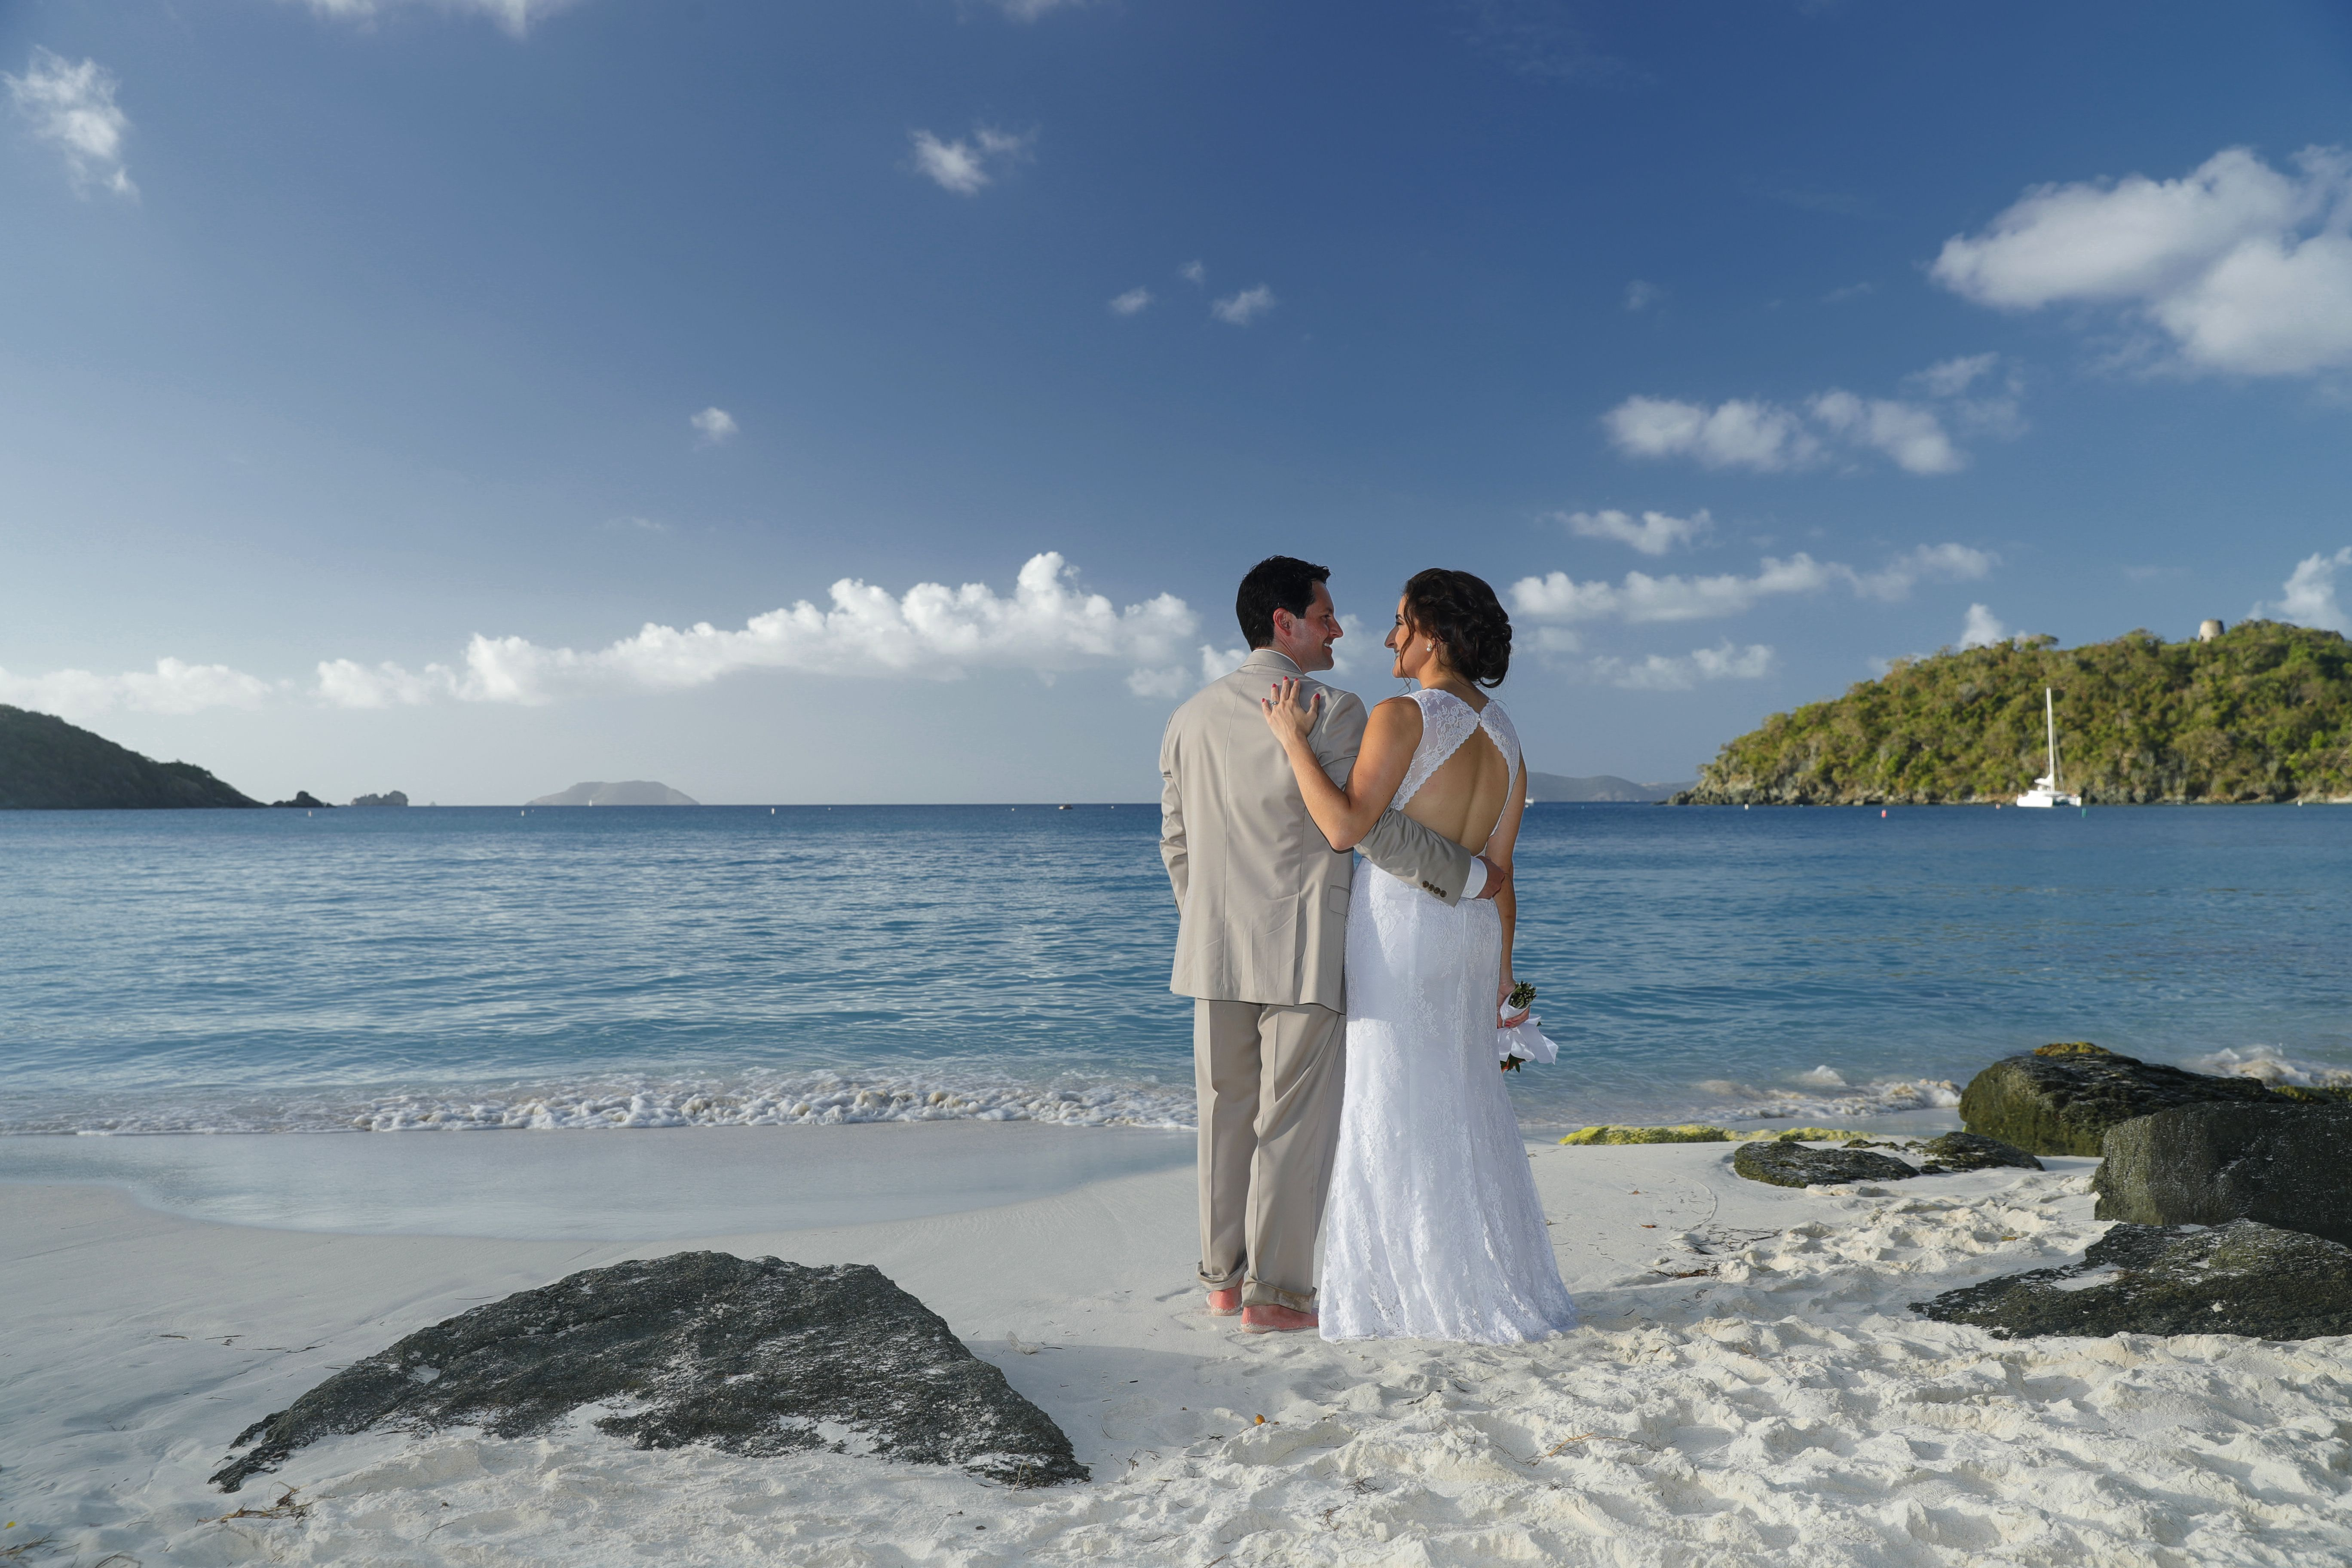 Morning ceremony on the beach in St. John. Caribbean